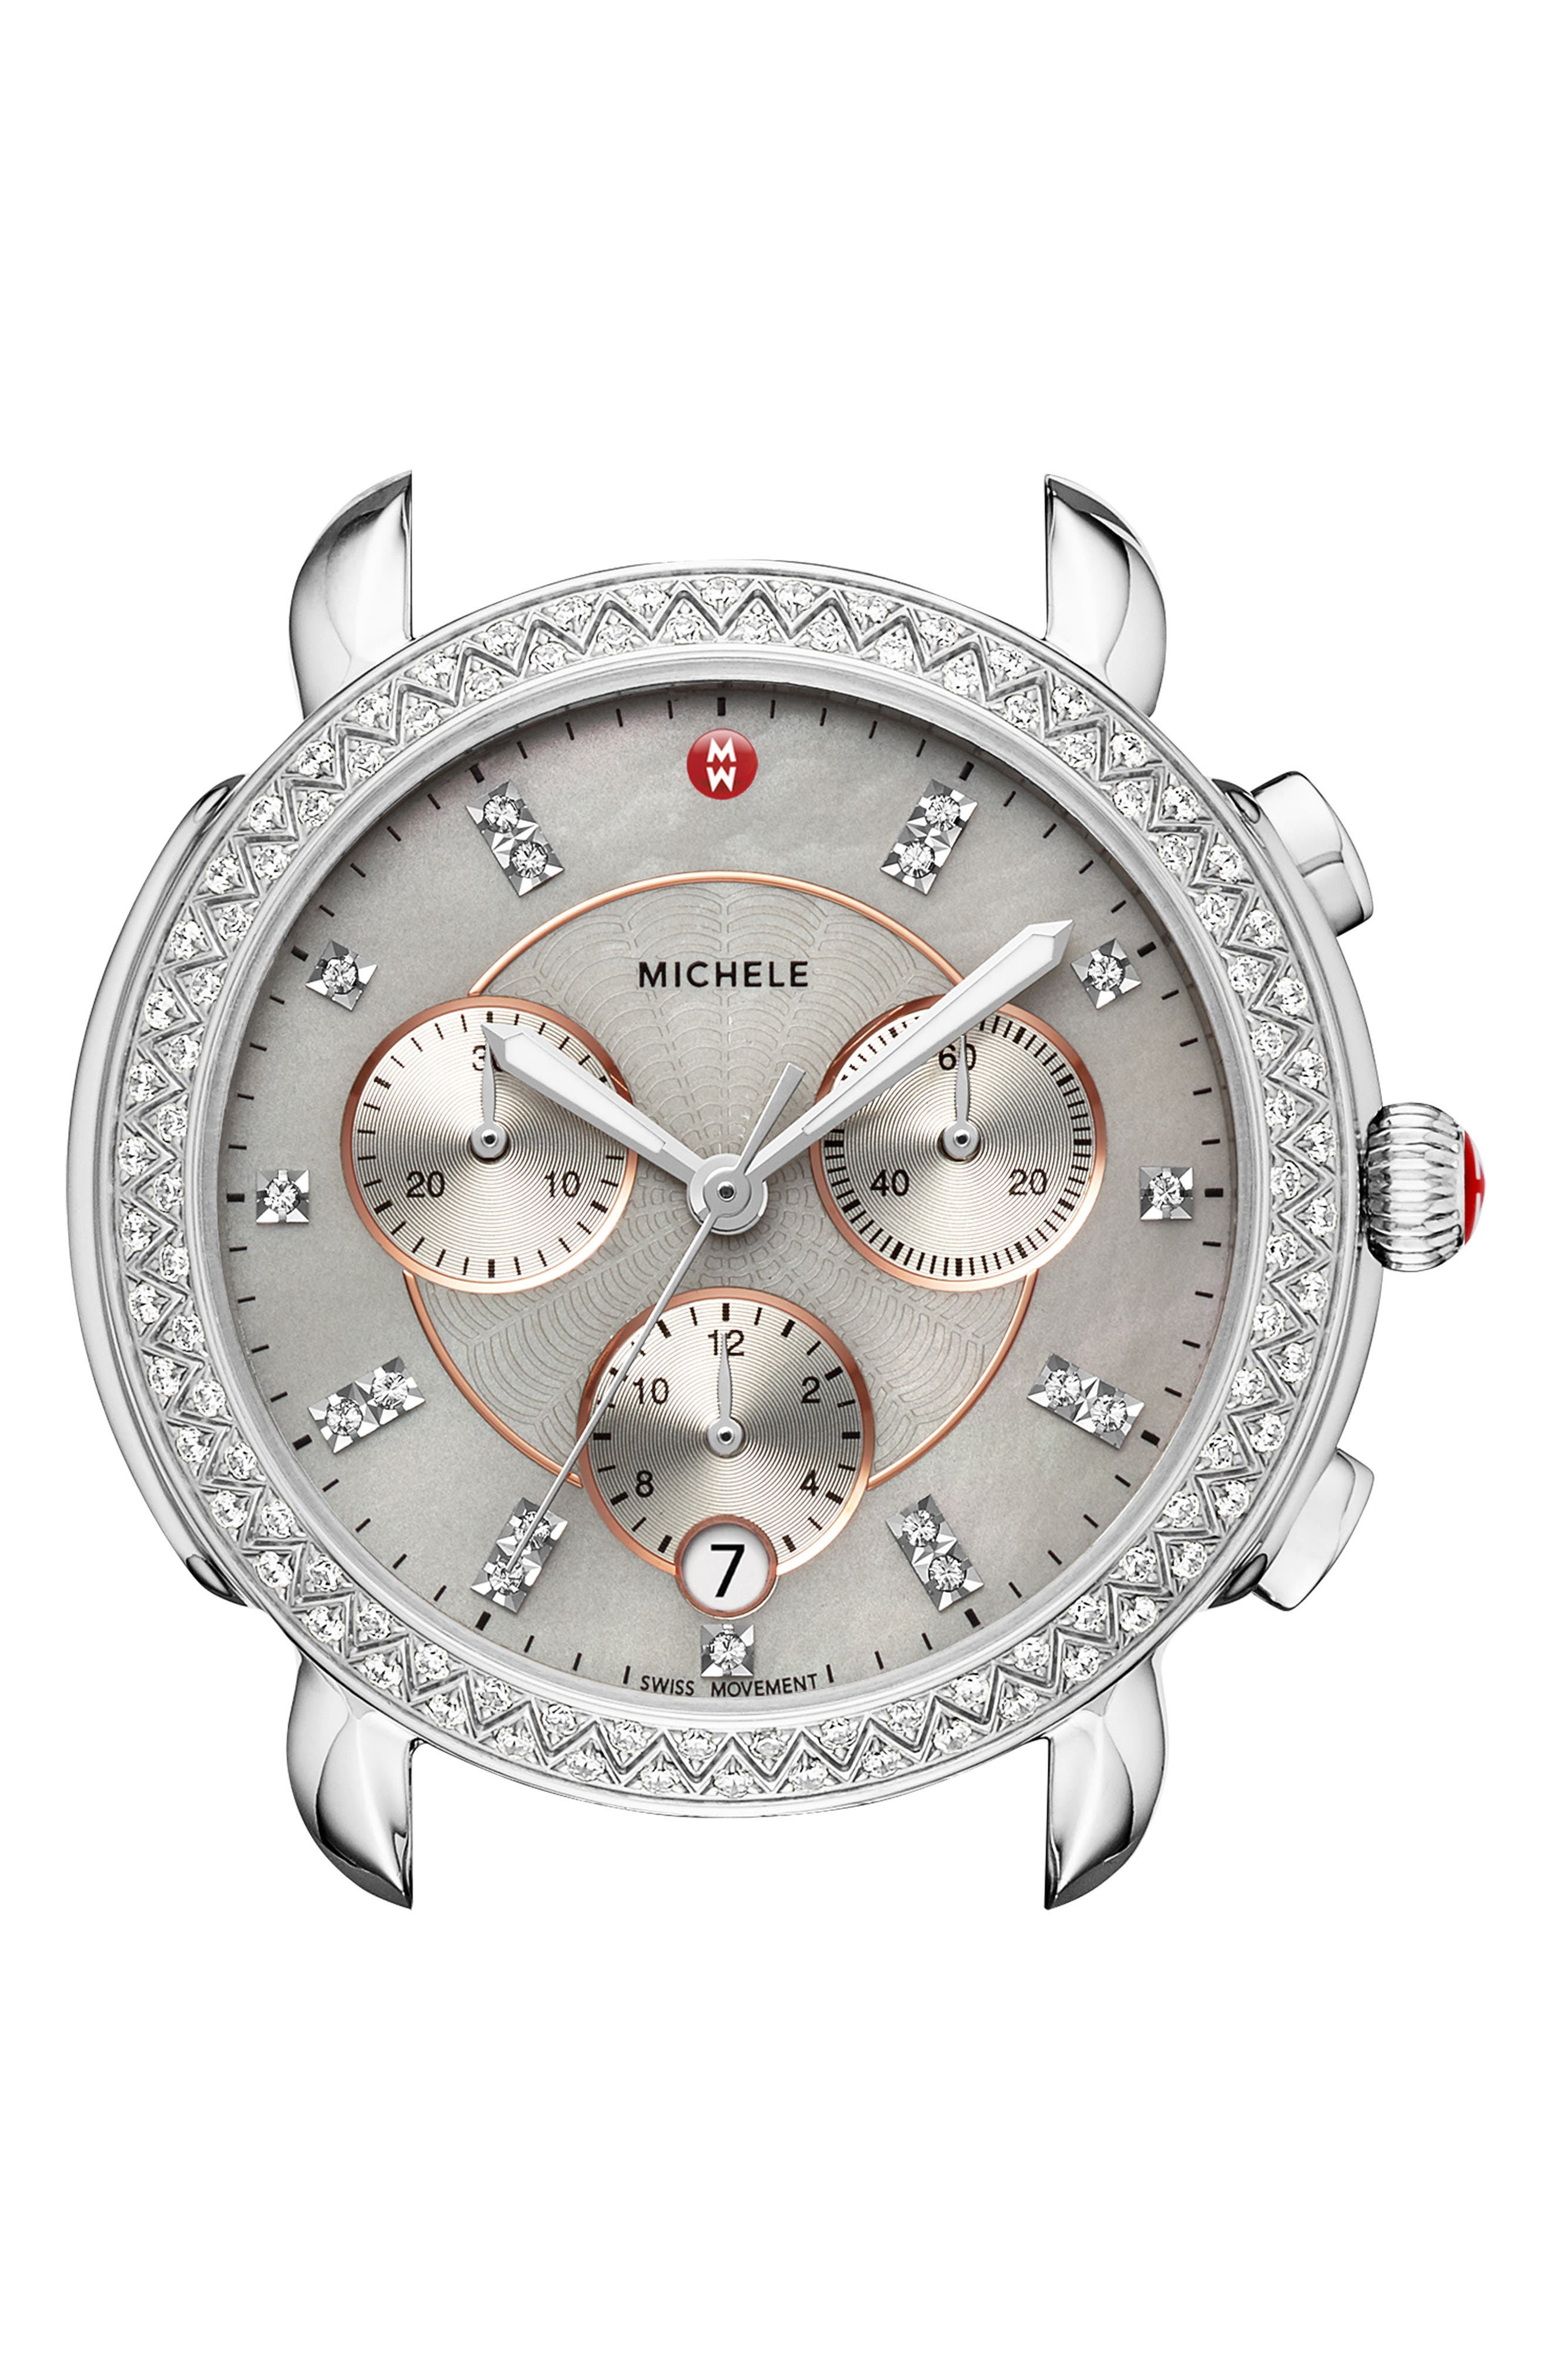 MICHELE Sidney Chrono Diamond Diamond Dial Watch Case, 38mm, Main, color, SILVER/ CASHMERE/ ROSE GOLD